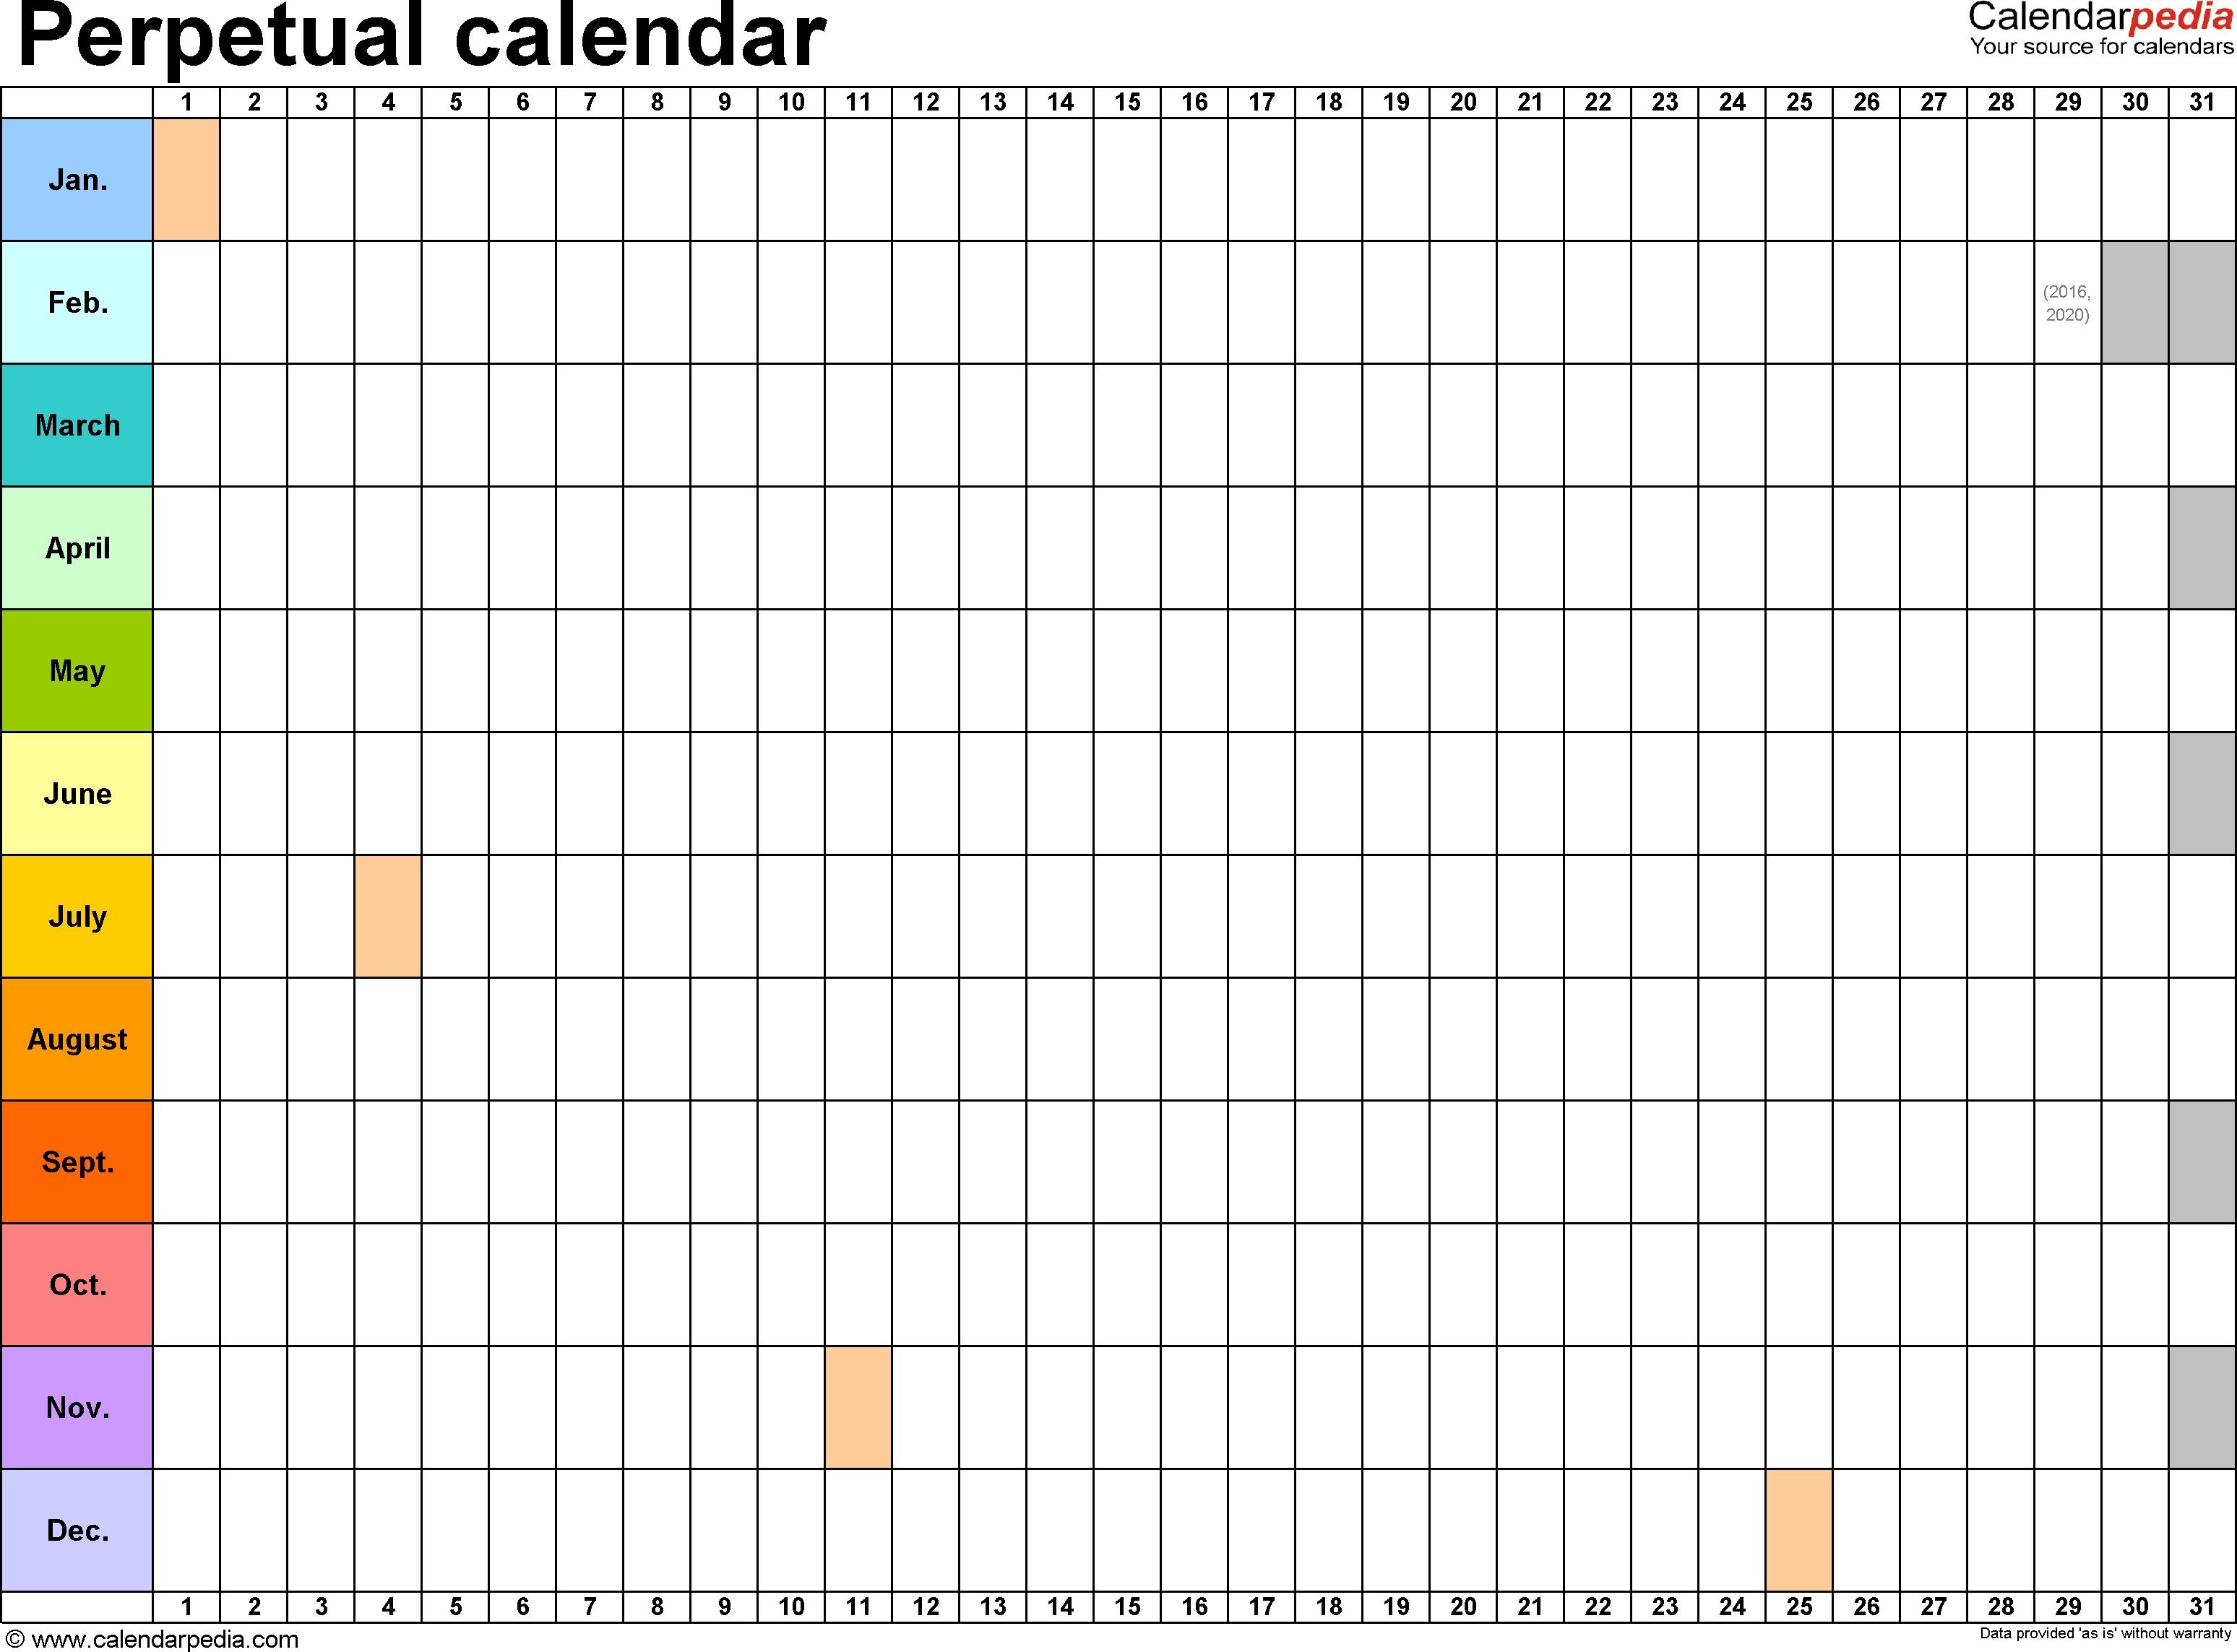 Perpetual Calendars - 7 Free Printable Excel Templates  3 Months In One Calenadar